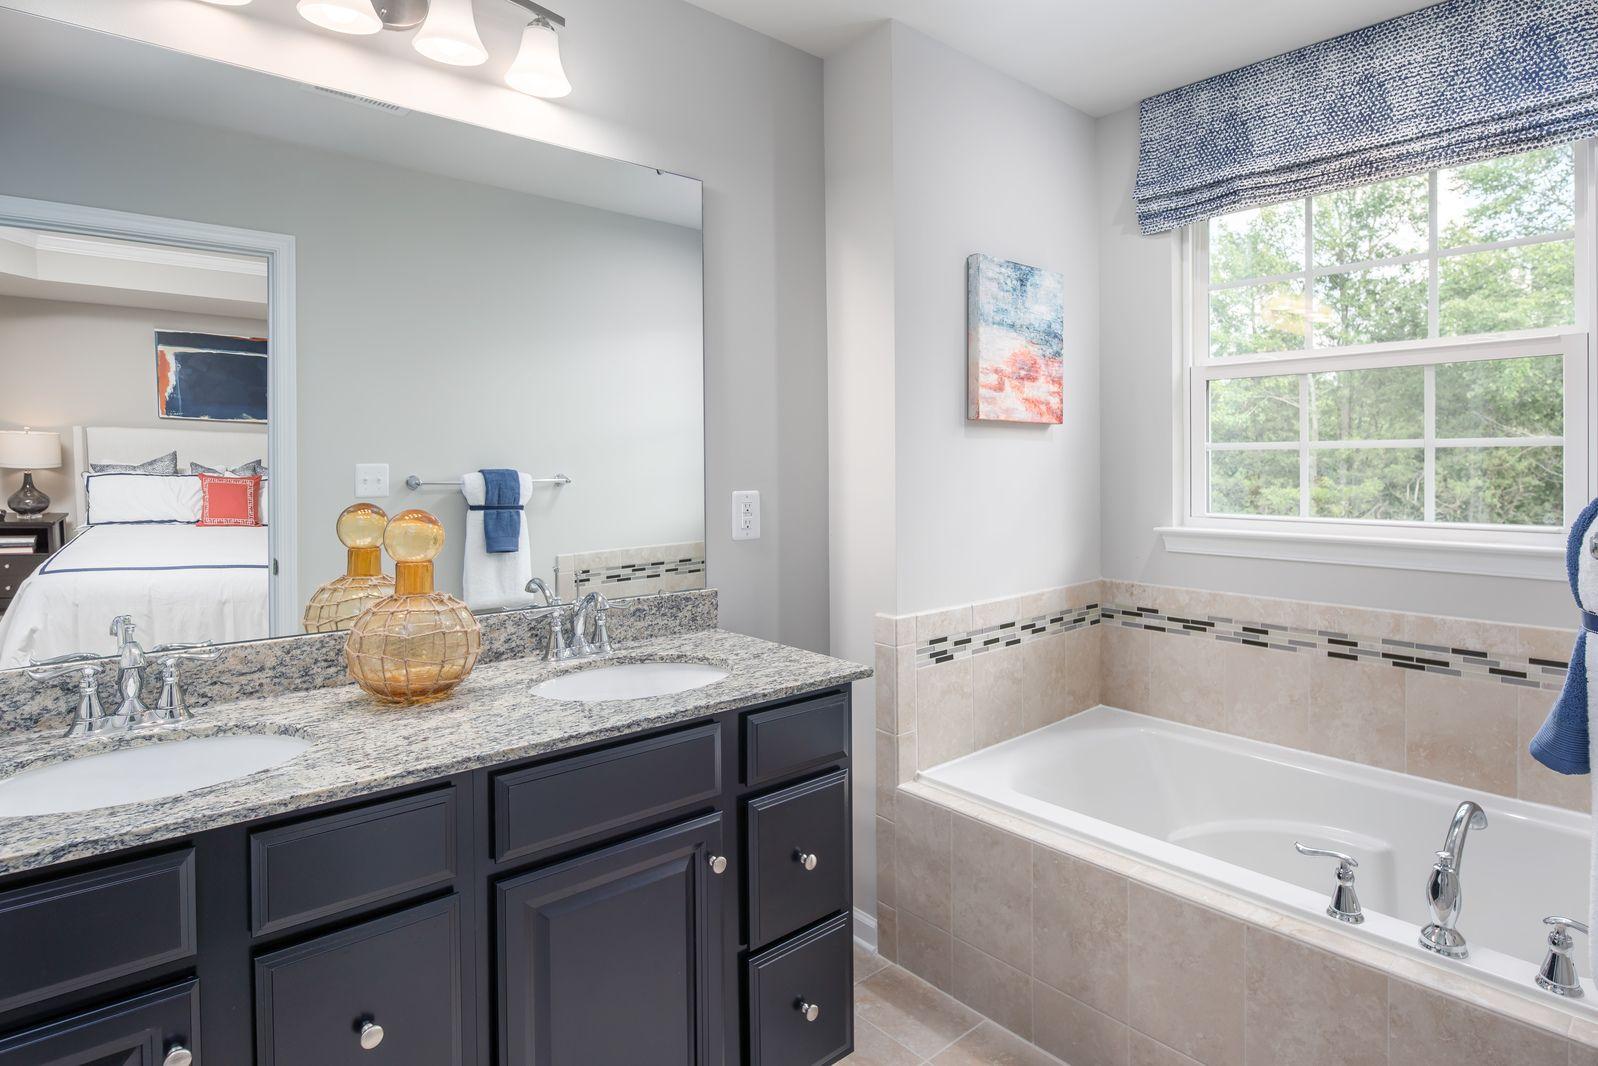 Bathroom featured in the Schubert By Ryan Homes in Washington, VA